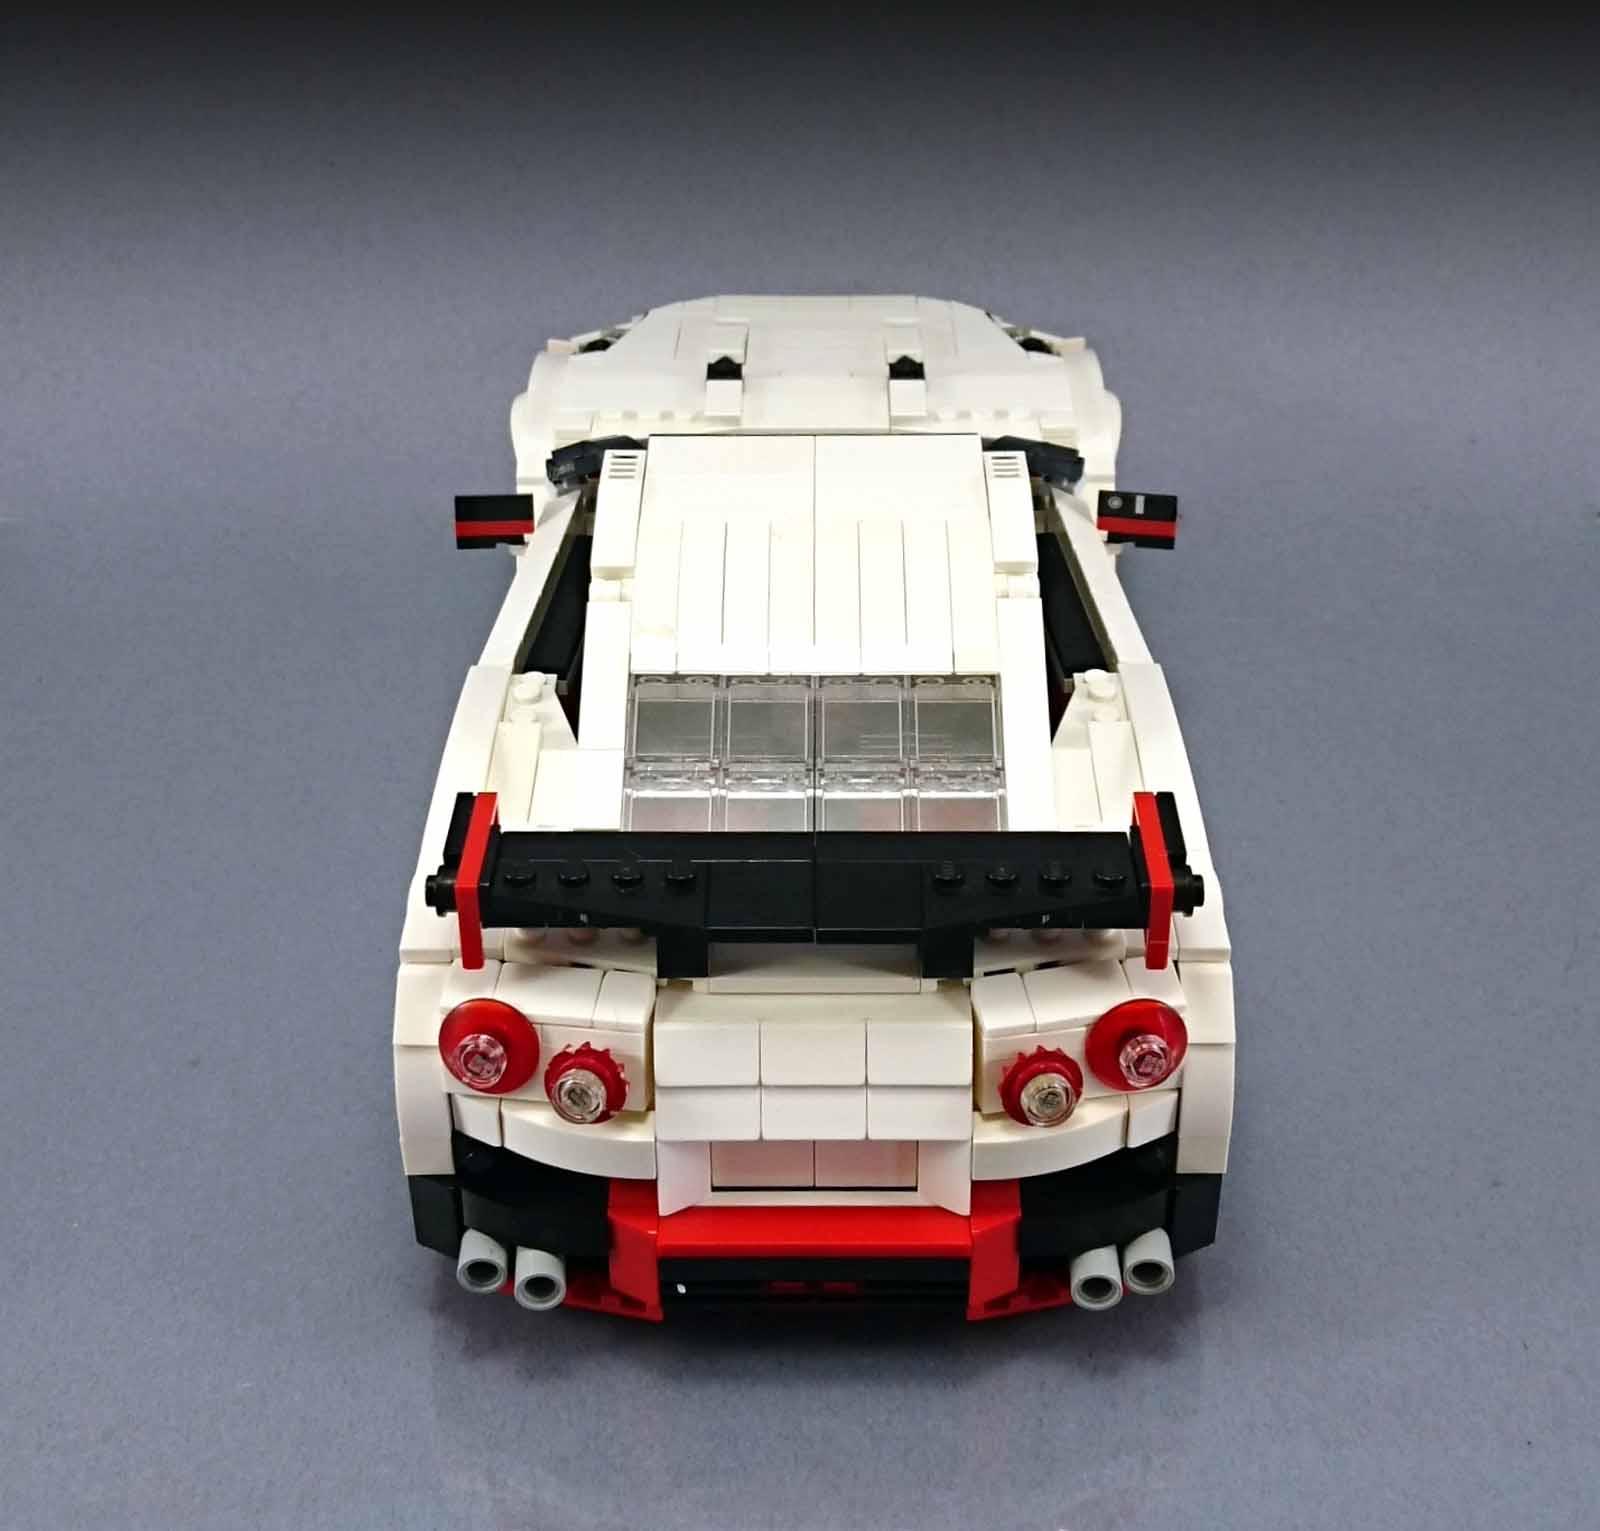 2017 Nissan Gt R Nismo >> Nissan GT-R Nismo Fan-Made Lego Replica Is the Blocky Godzilla You Wish You Had - autoevolution